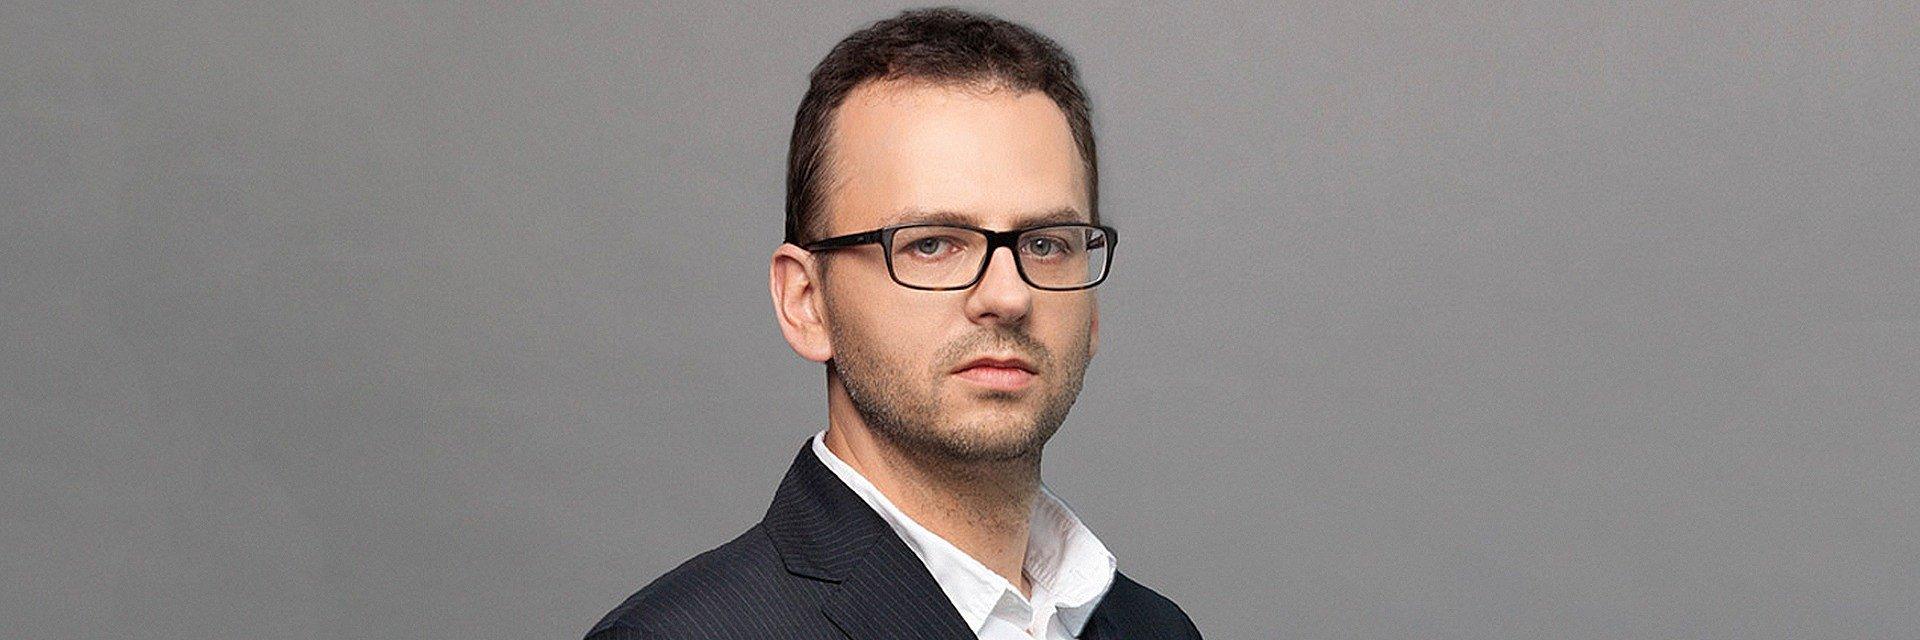 Sławomir Kornicki, Managing Partner i Chief Data Officer w Booost (Grupa S/F).